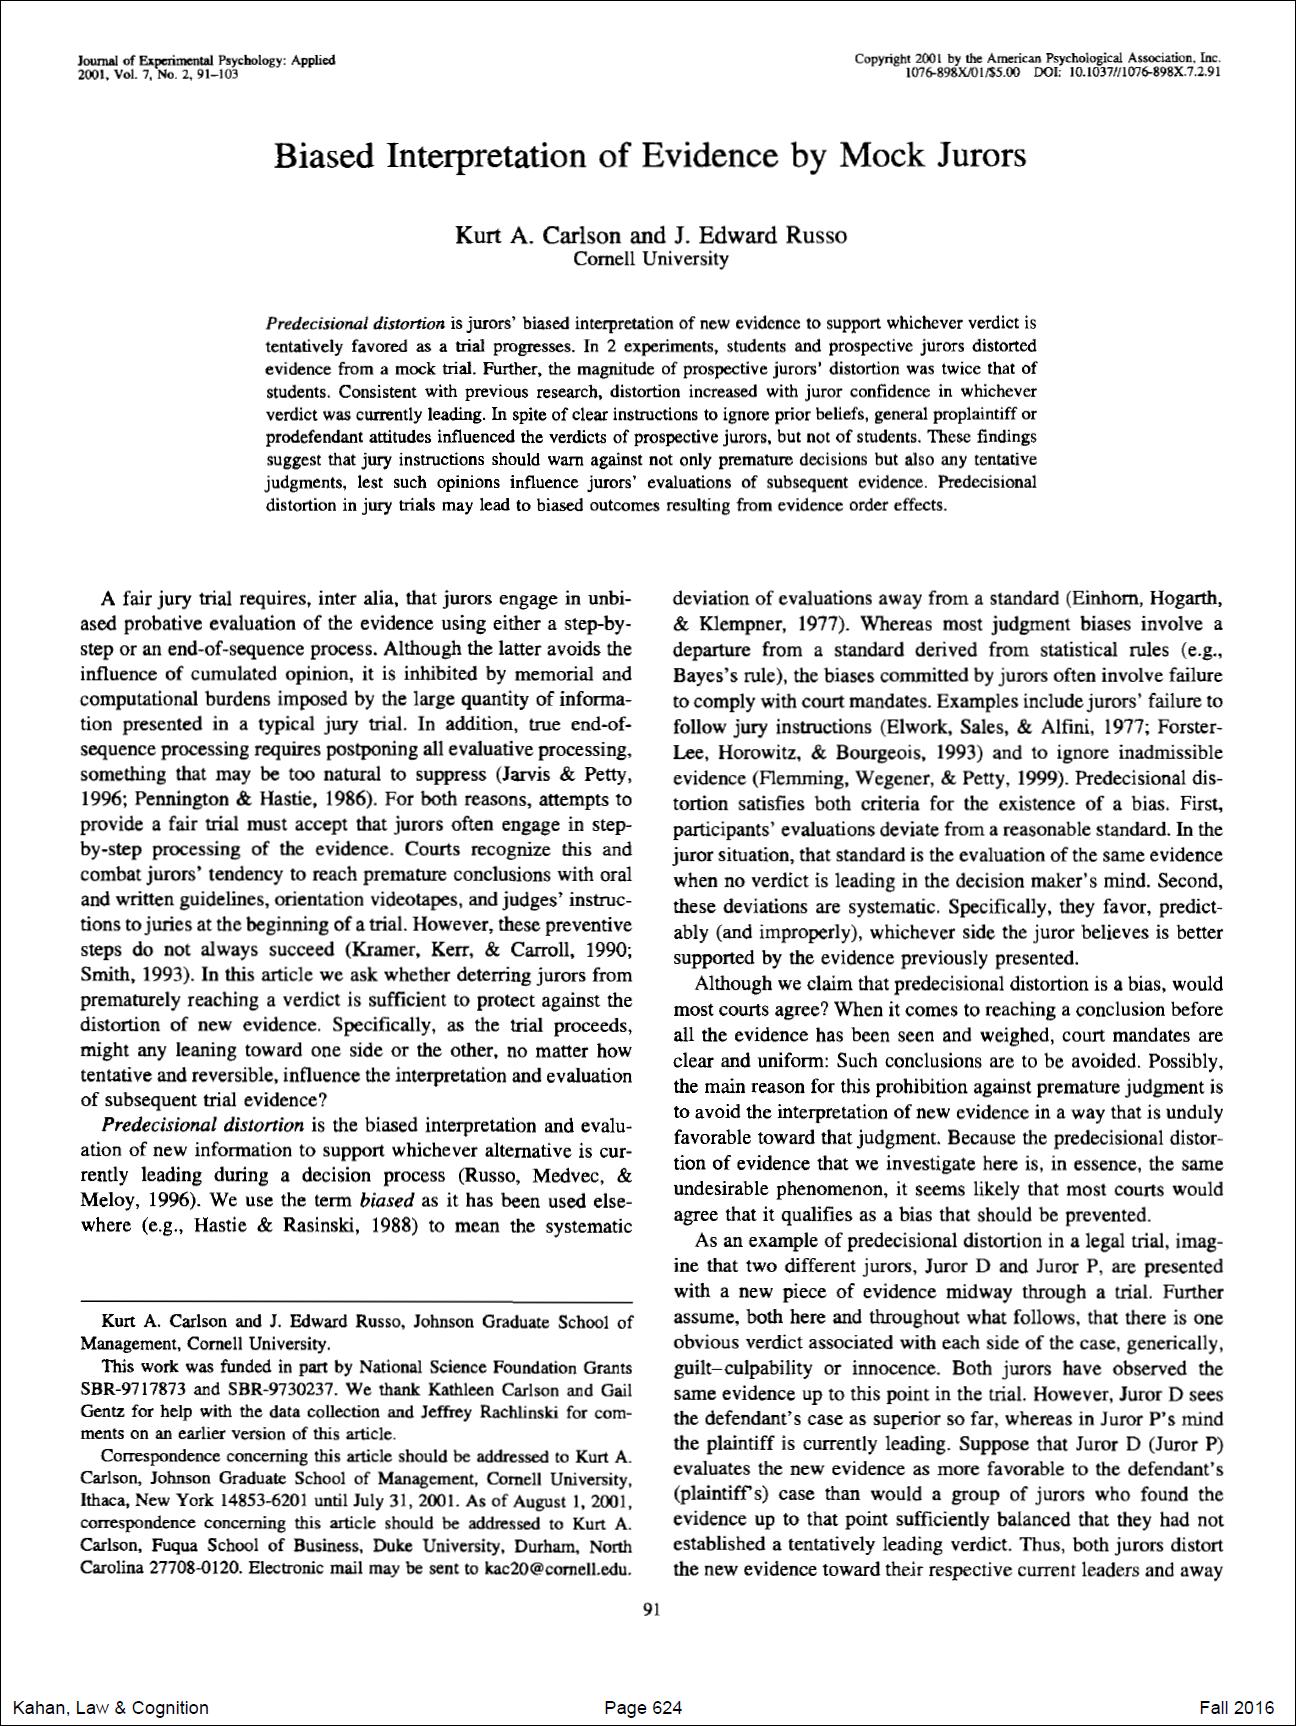 opm300 slp 1 introduction to operation Xxxxxxx xxxxxxx xxxxxxxxx xxxxxxxxx of xxxxxxxx opm300 - introto operations mgmt slp  ecommerce website  2011 strategic management task 1.